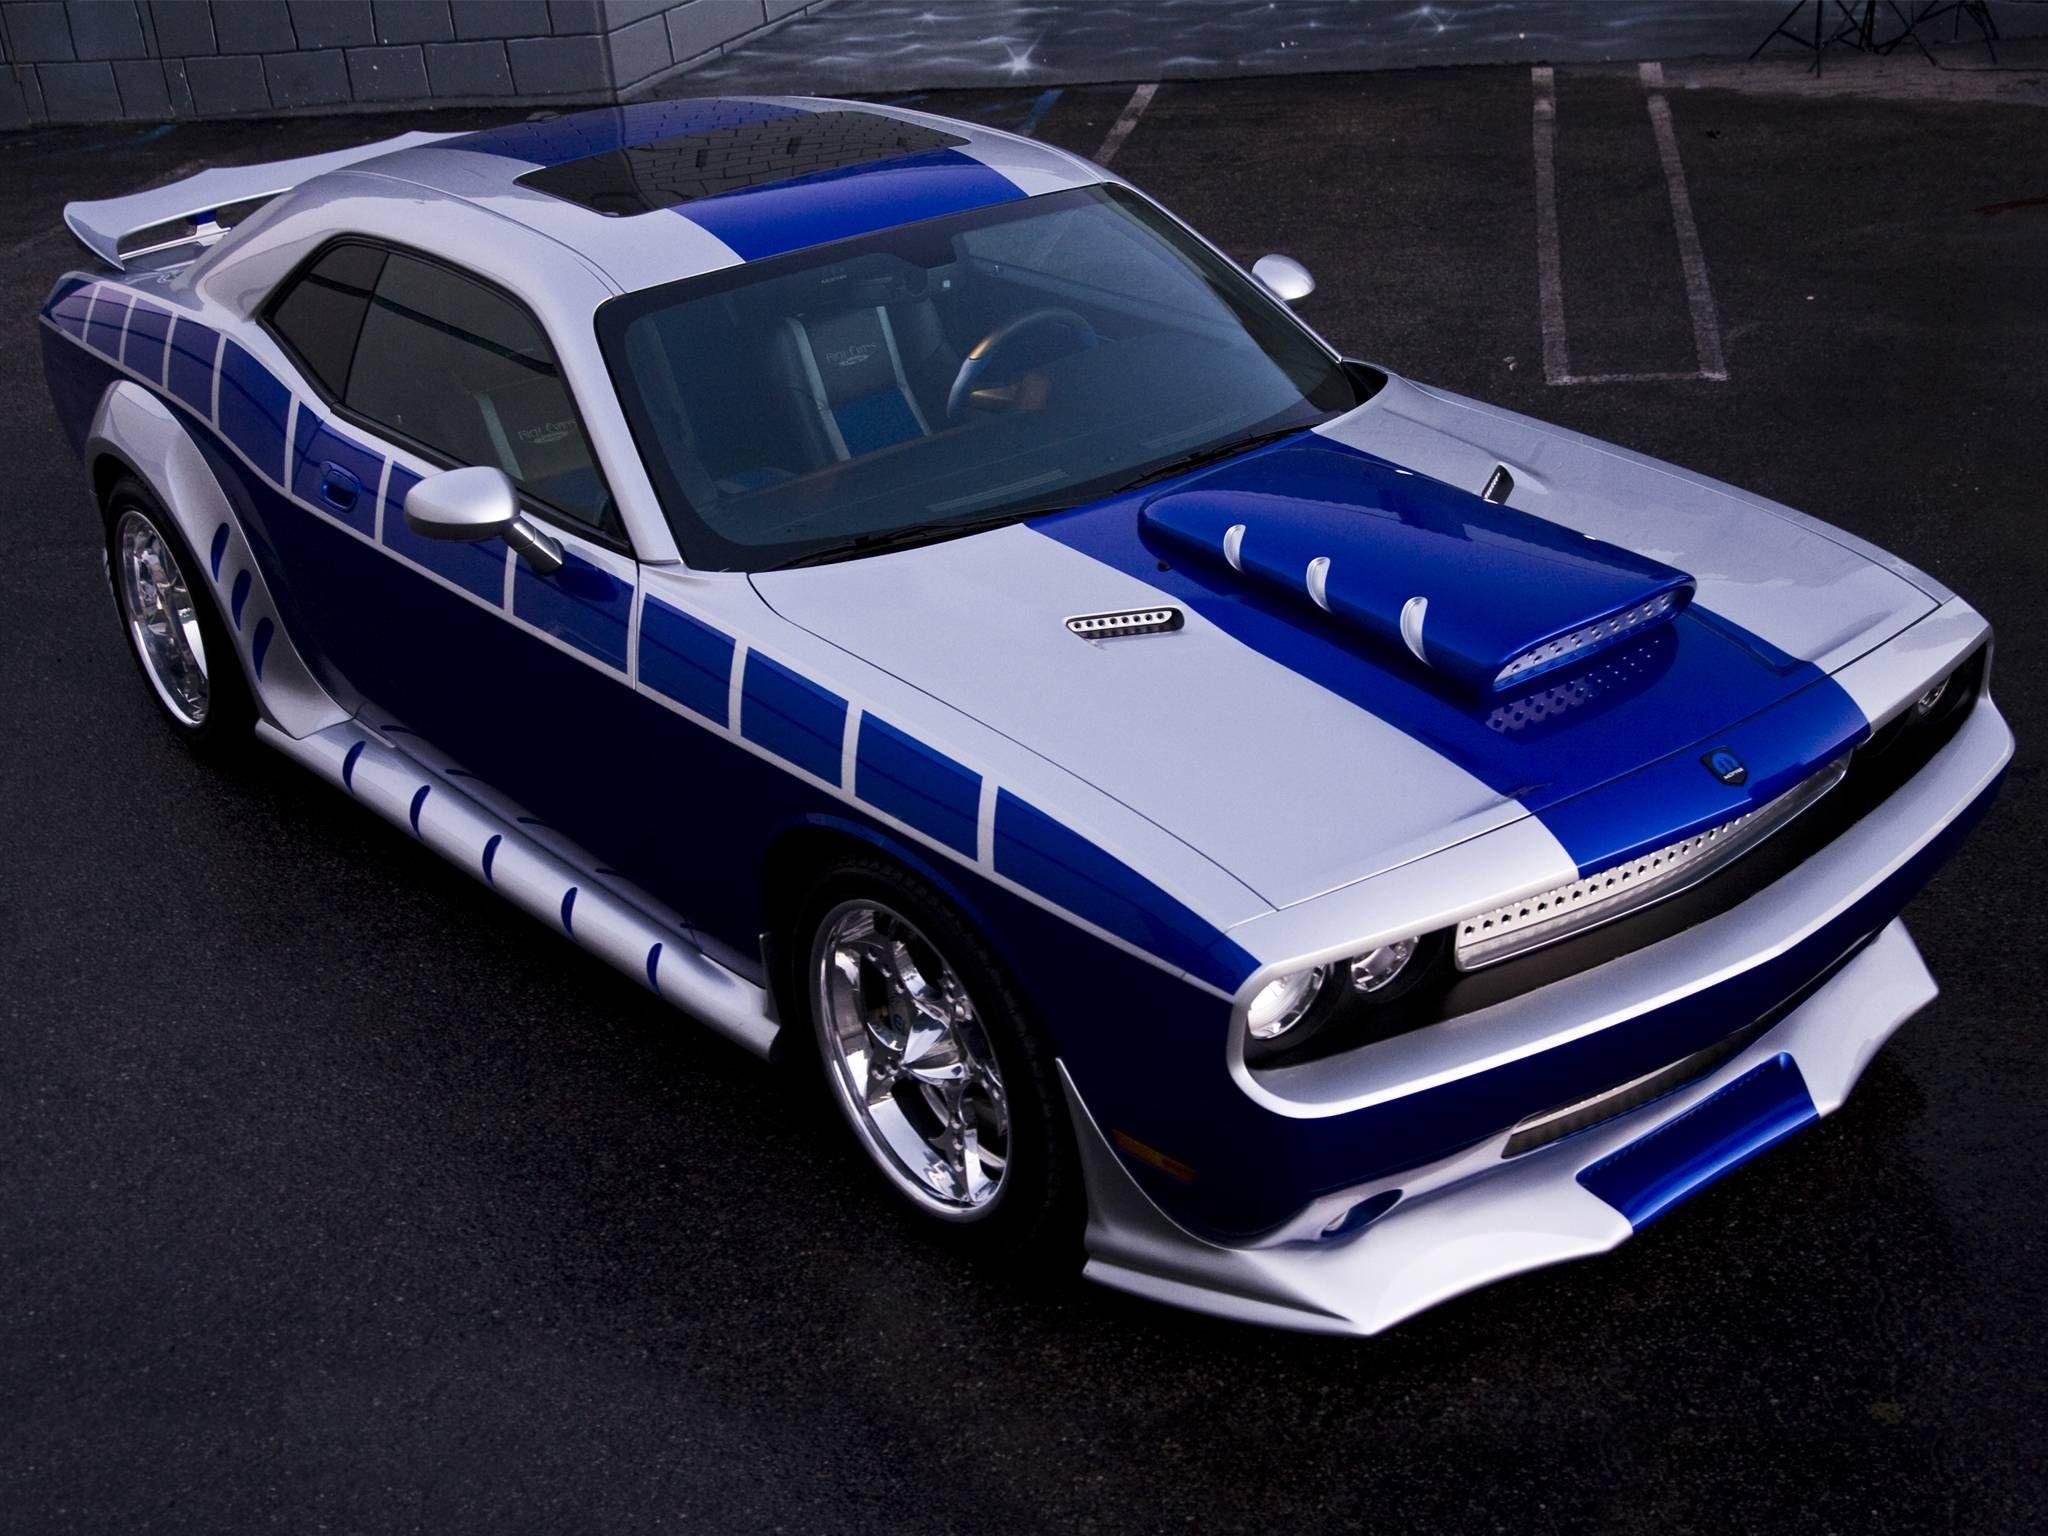 Res: 2048x1536, Free Download Dodge Challenger Mopar Hd Wallpaper Lowrider Car .